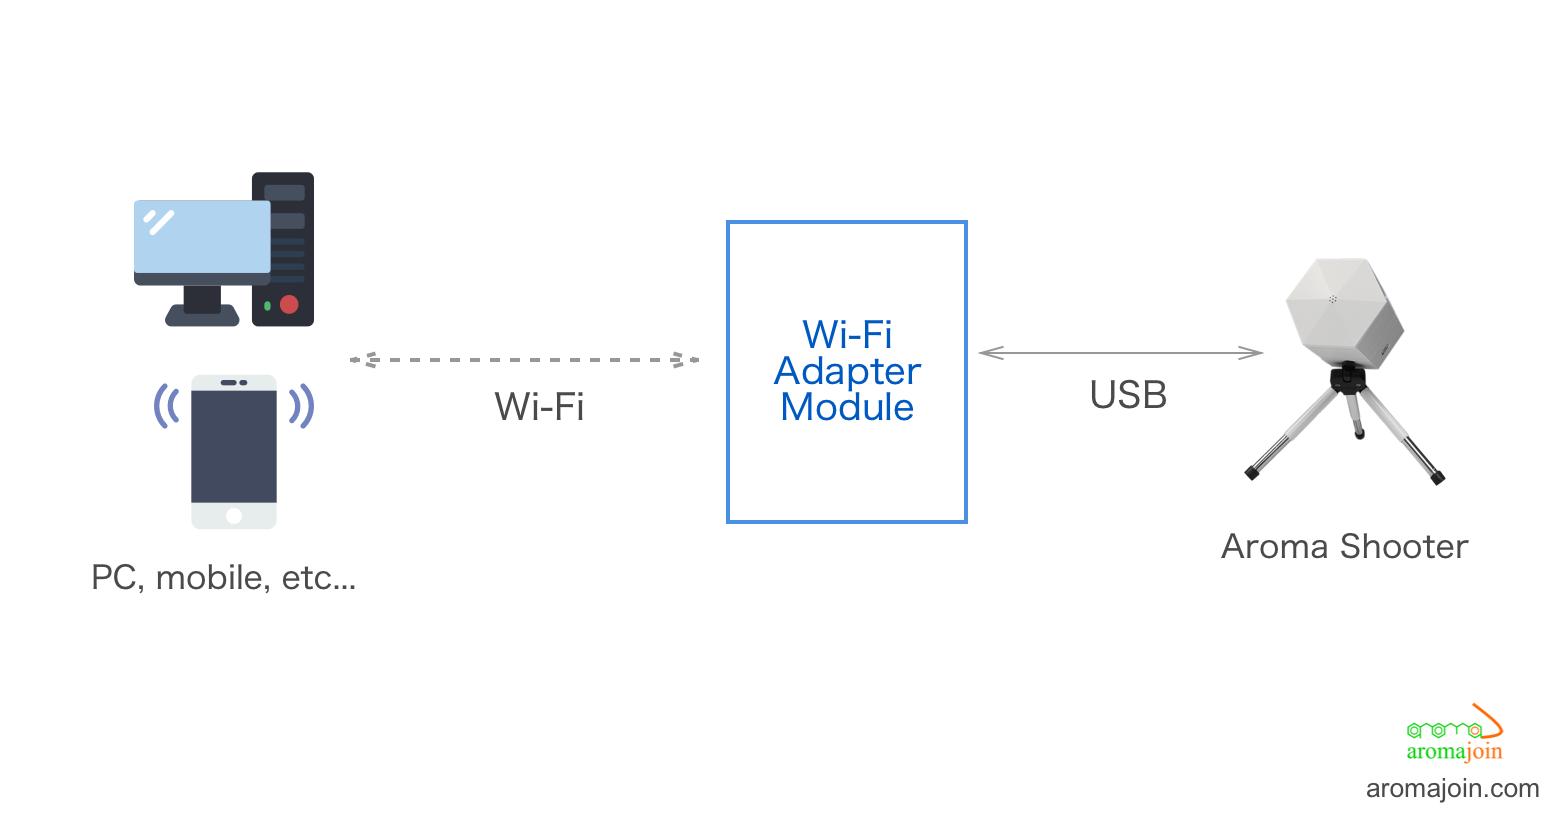 Wi-Fiアダプタモジュールを使用してアロマシューターの接続を拡張する